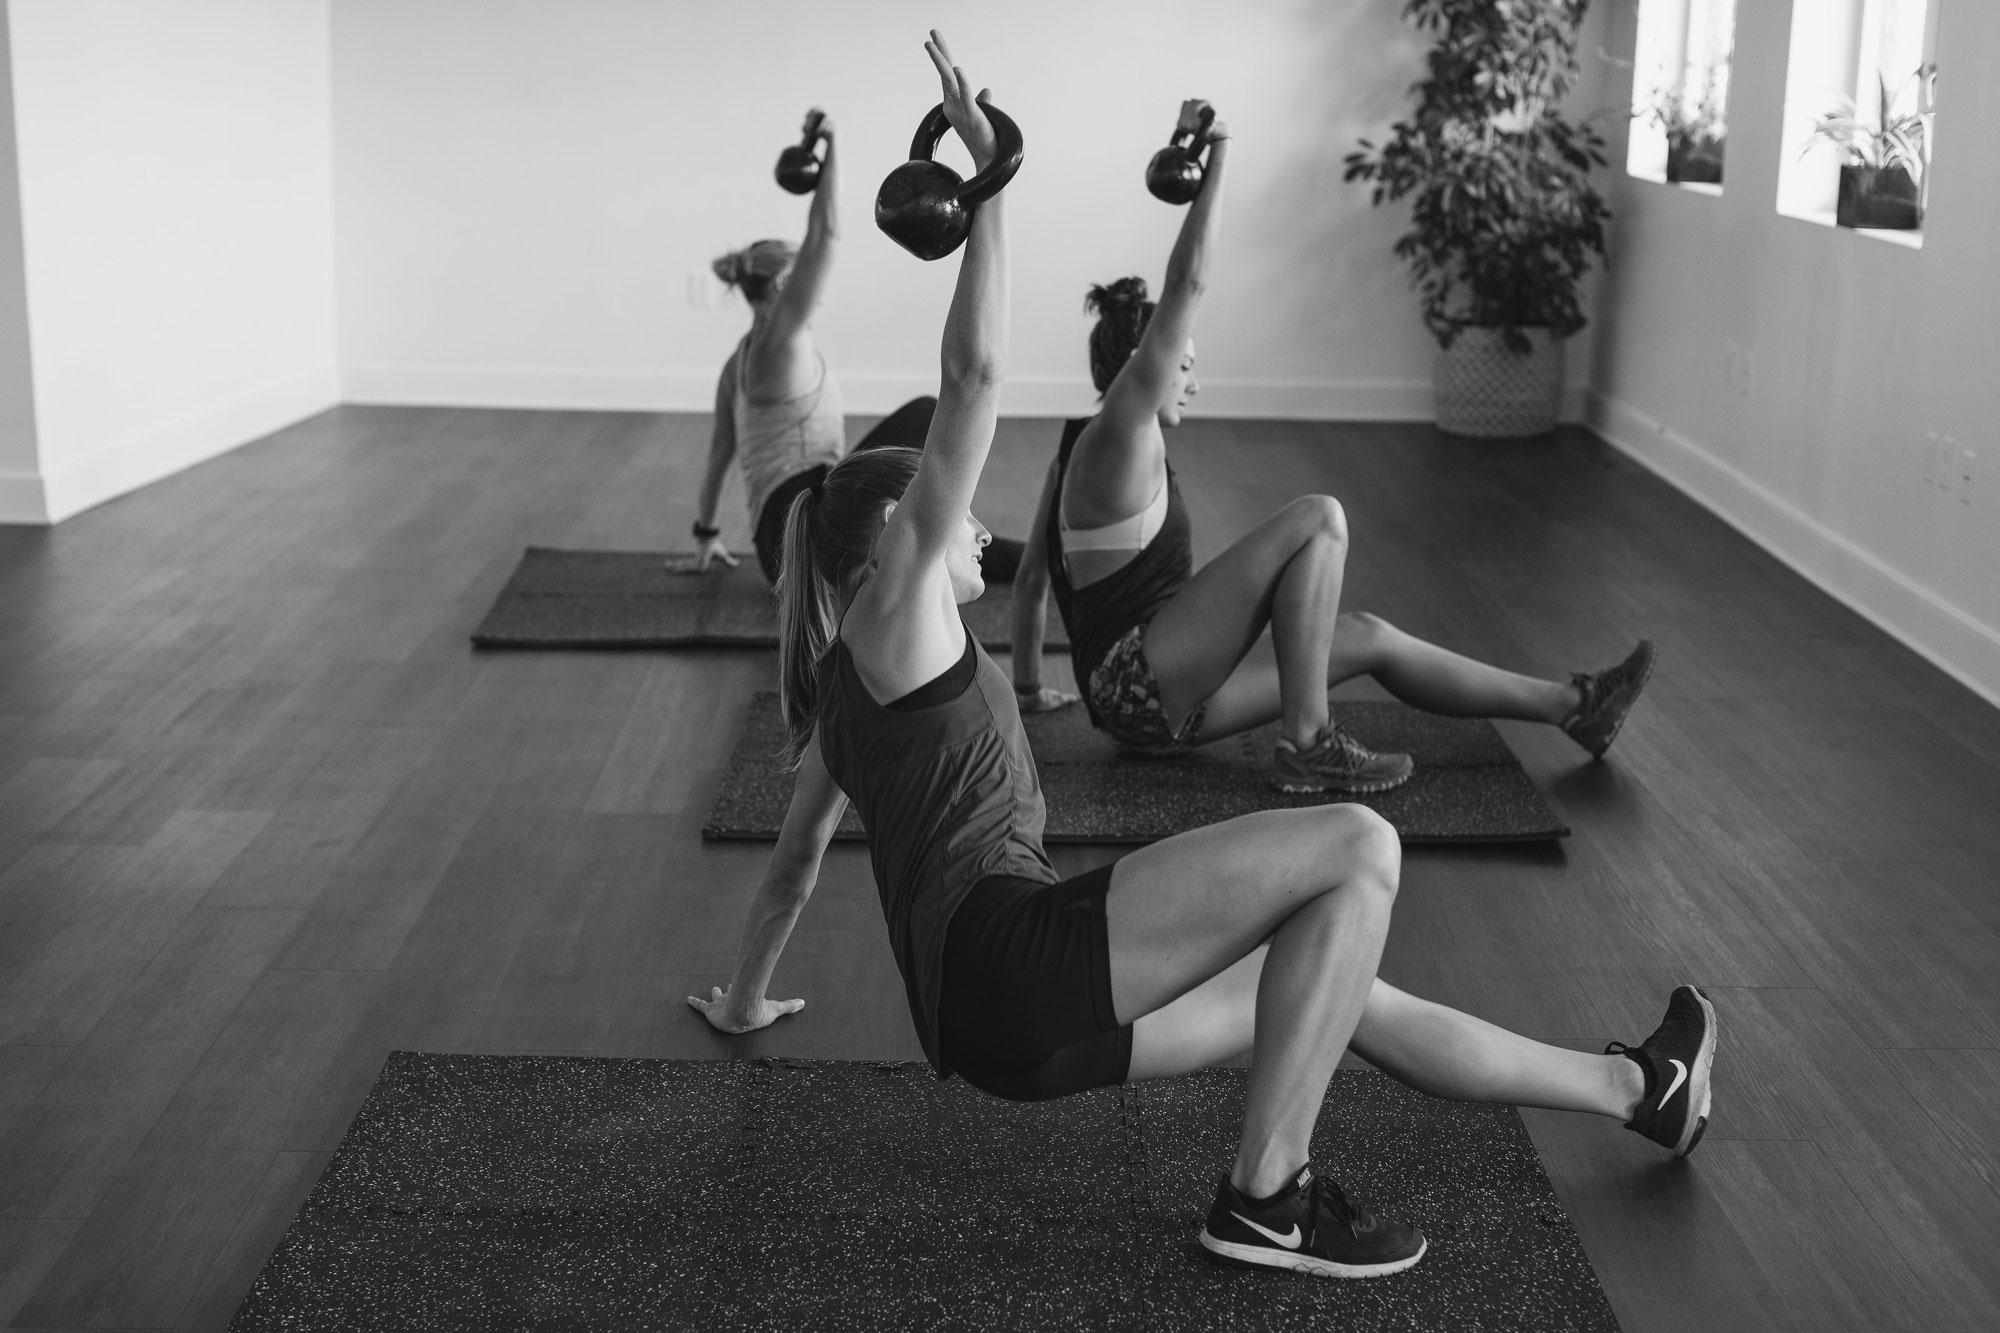 Seek_Yoga_Fitness_TRX_utah.jpg